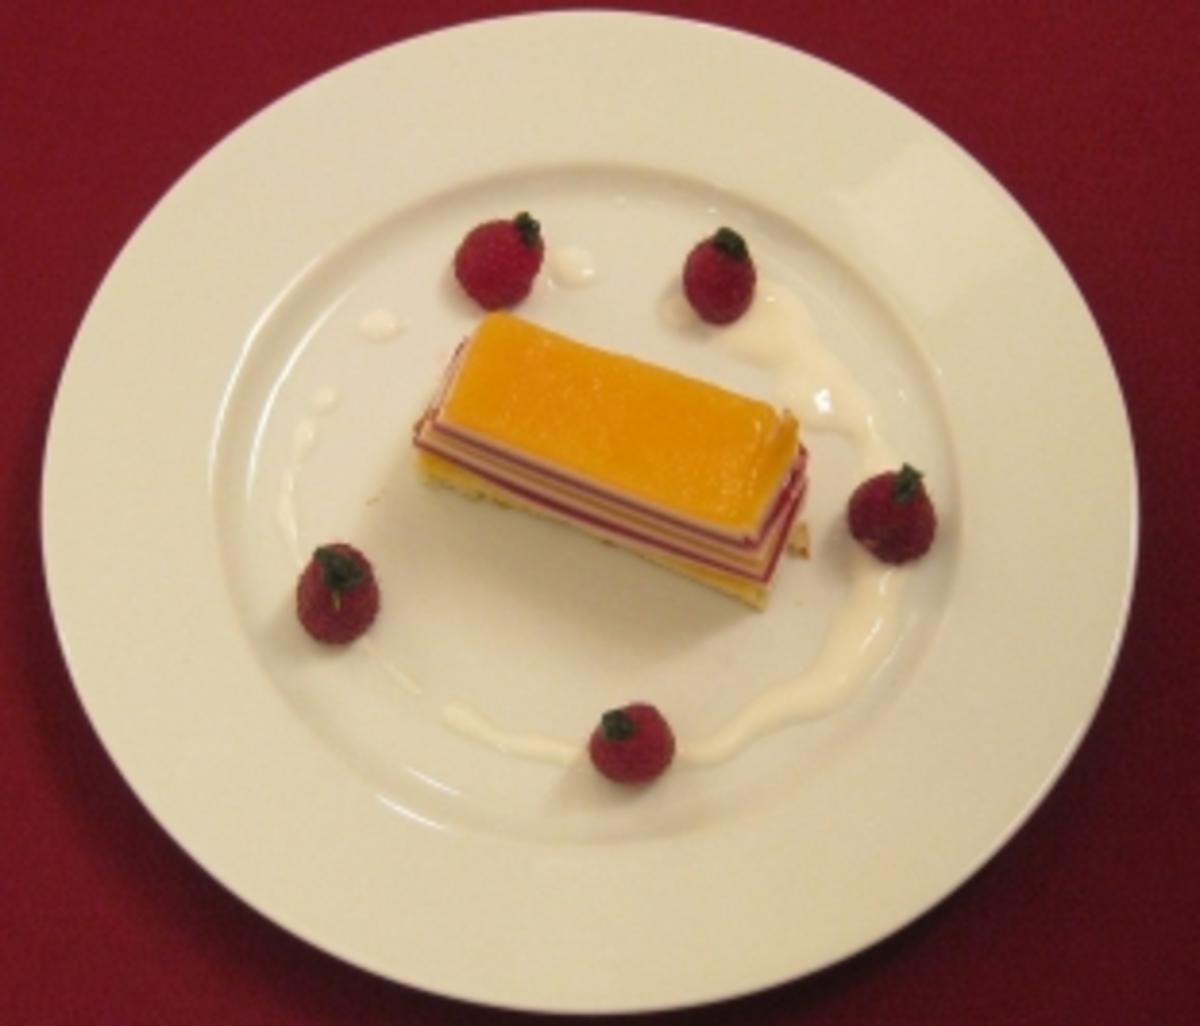 Joghurtterrine Pfirsich Melba Rot Gelb Wei Gestreift